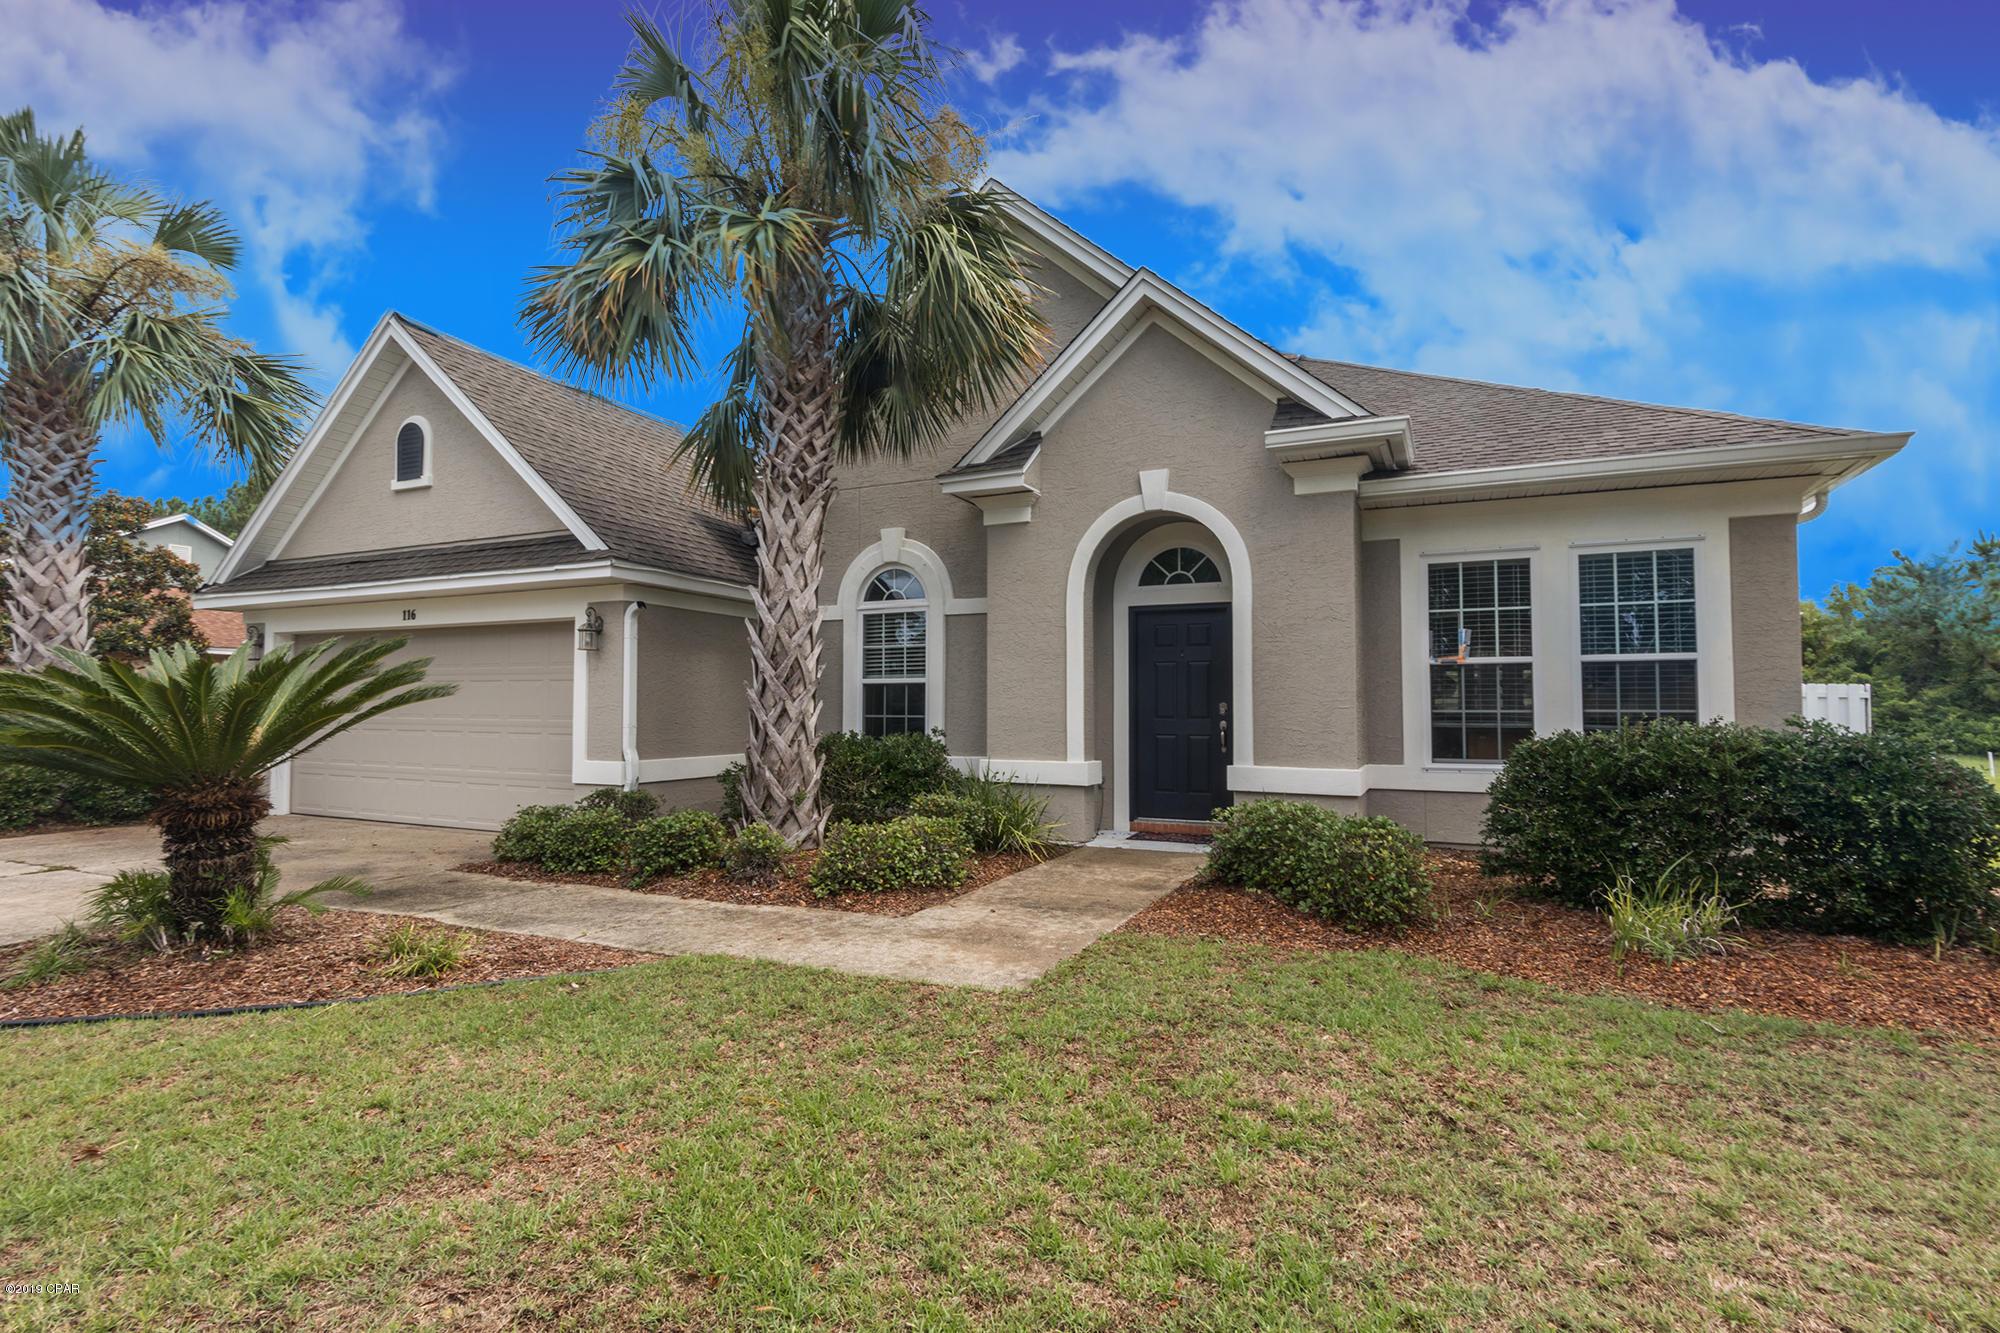 Property ID 686049